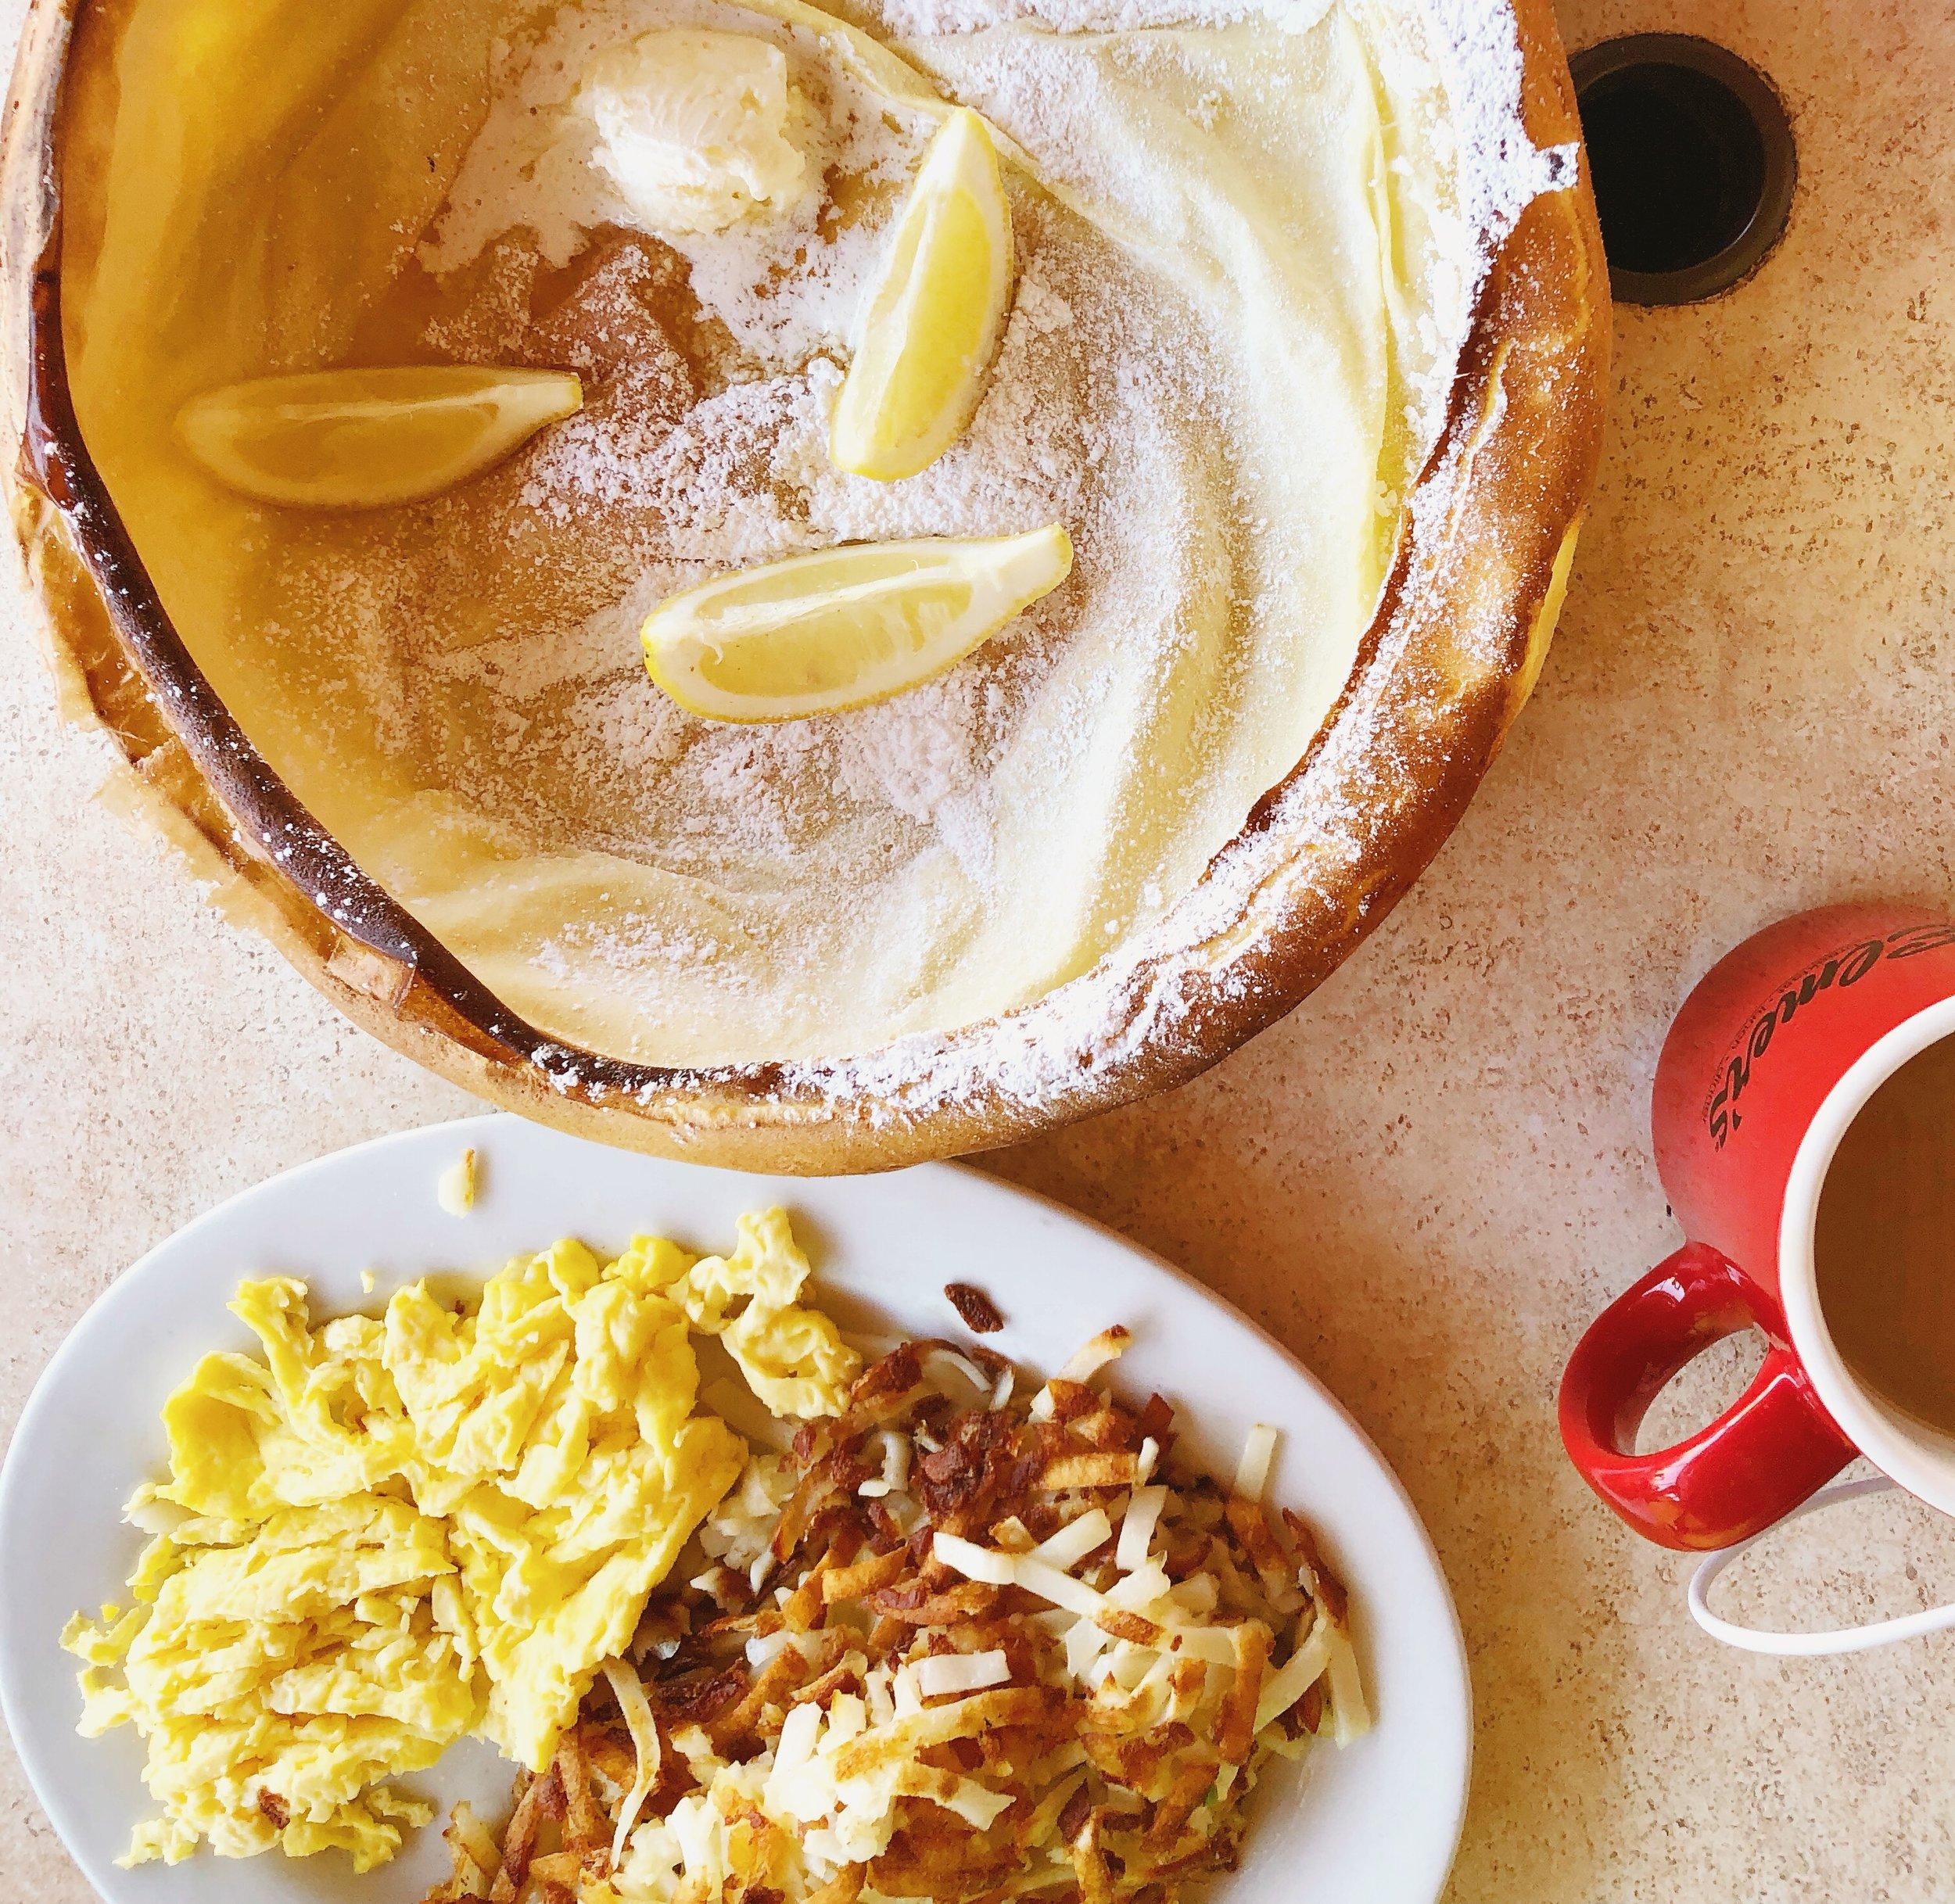 Breakfast at Elmer's featuring that epic German Pancake